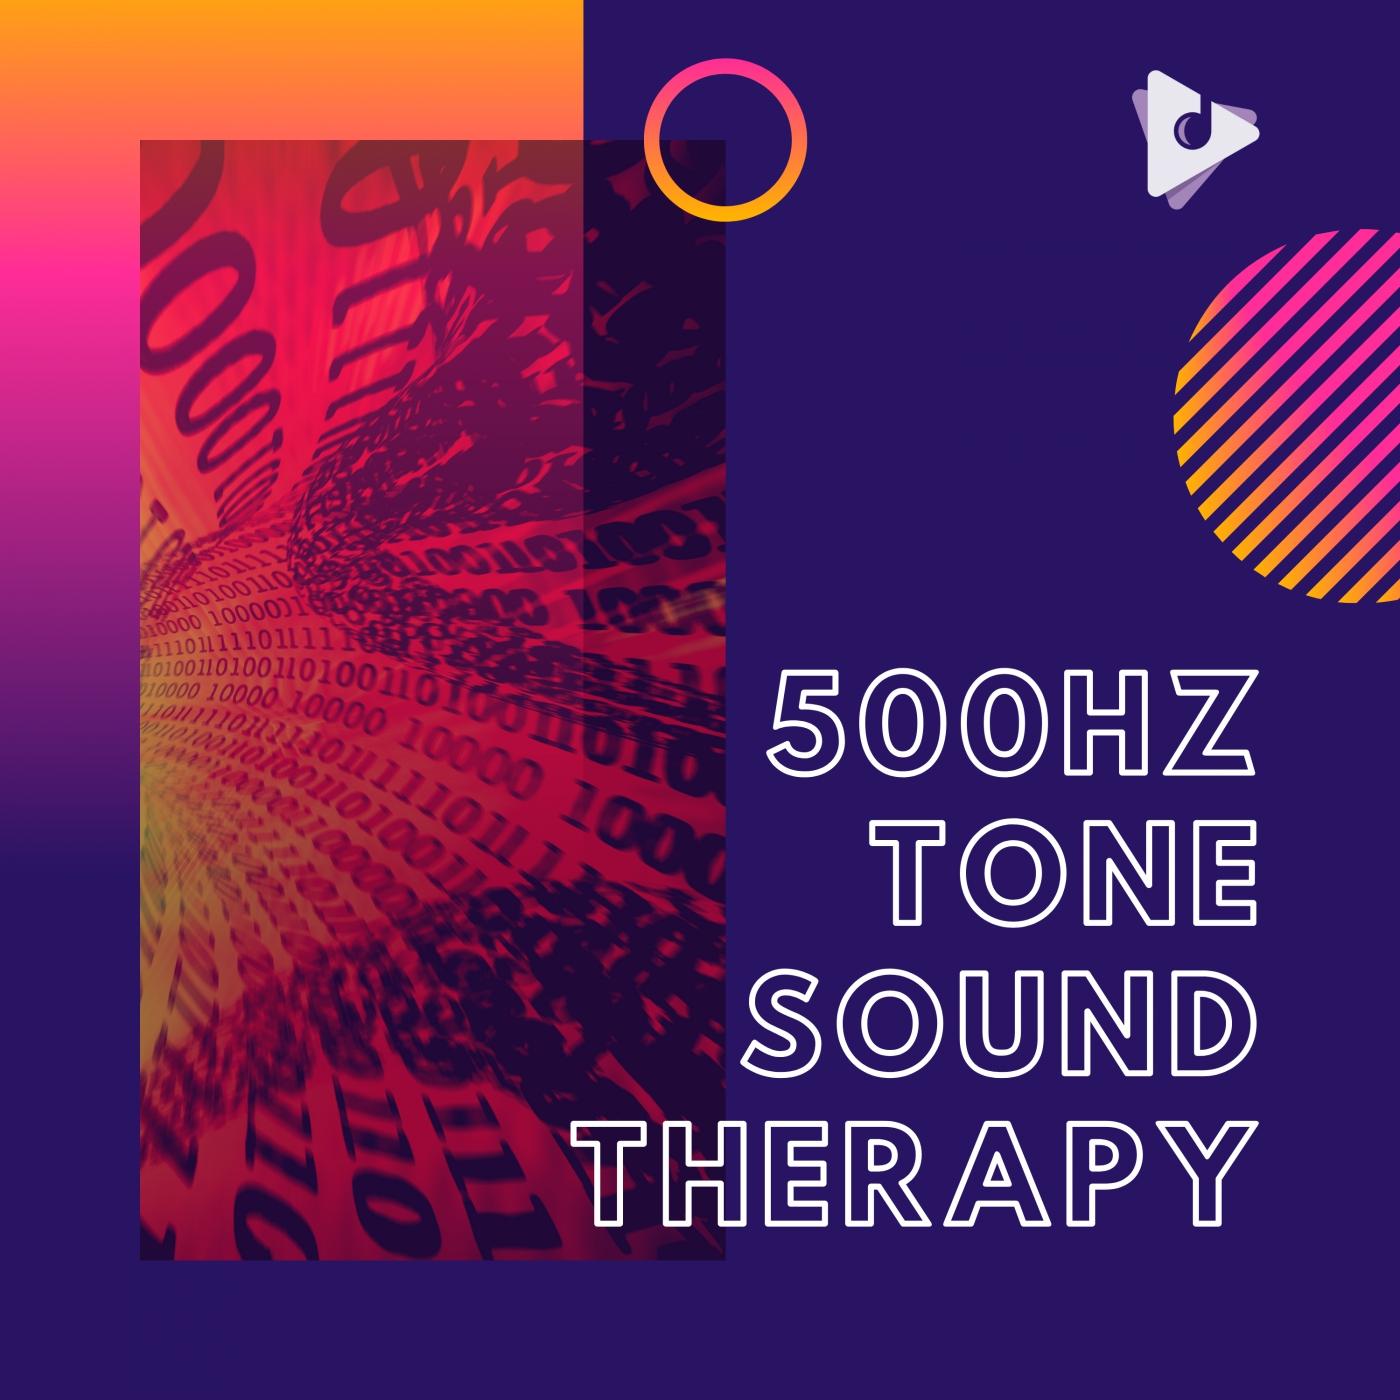 500Hz Tone Sound Therapy